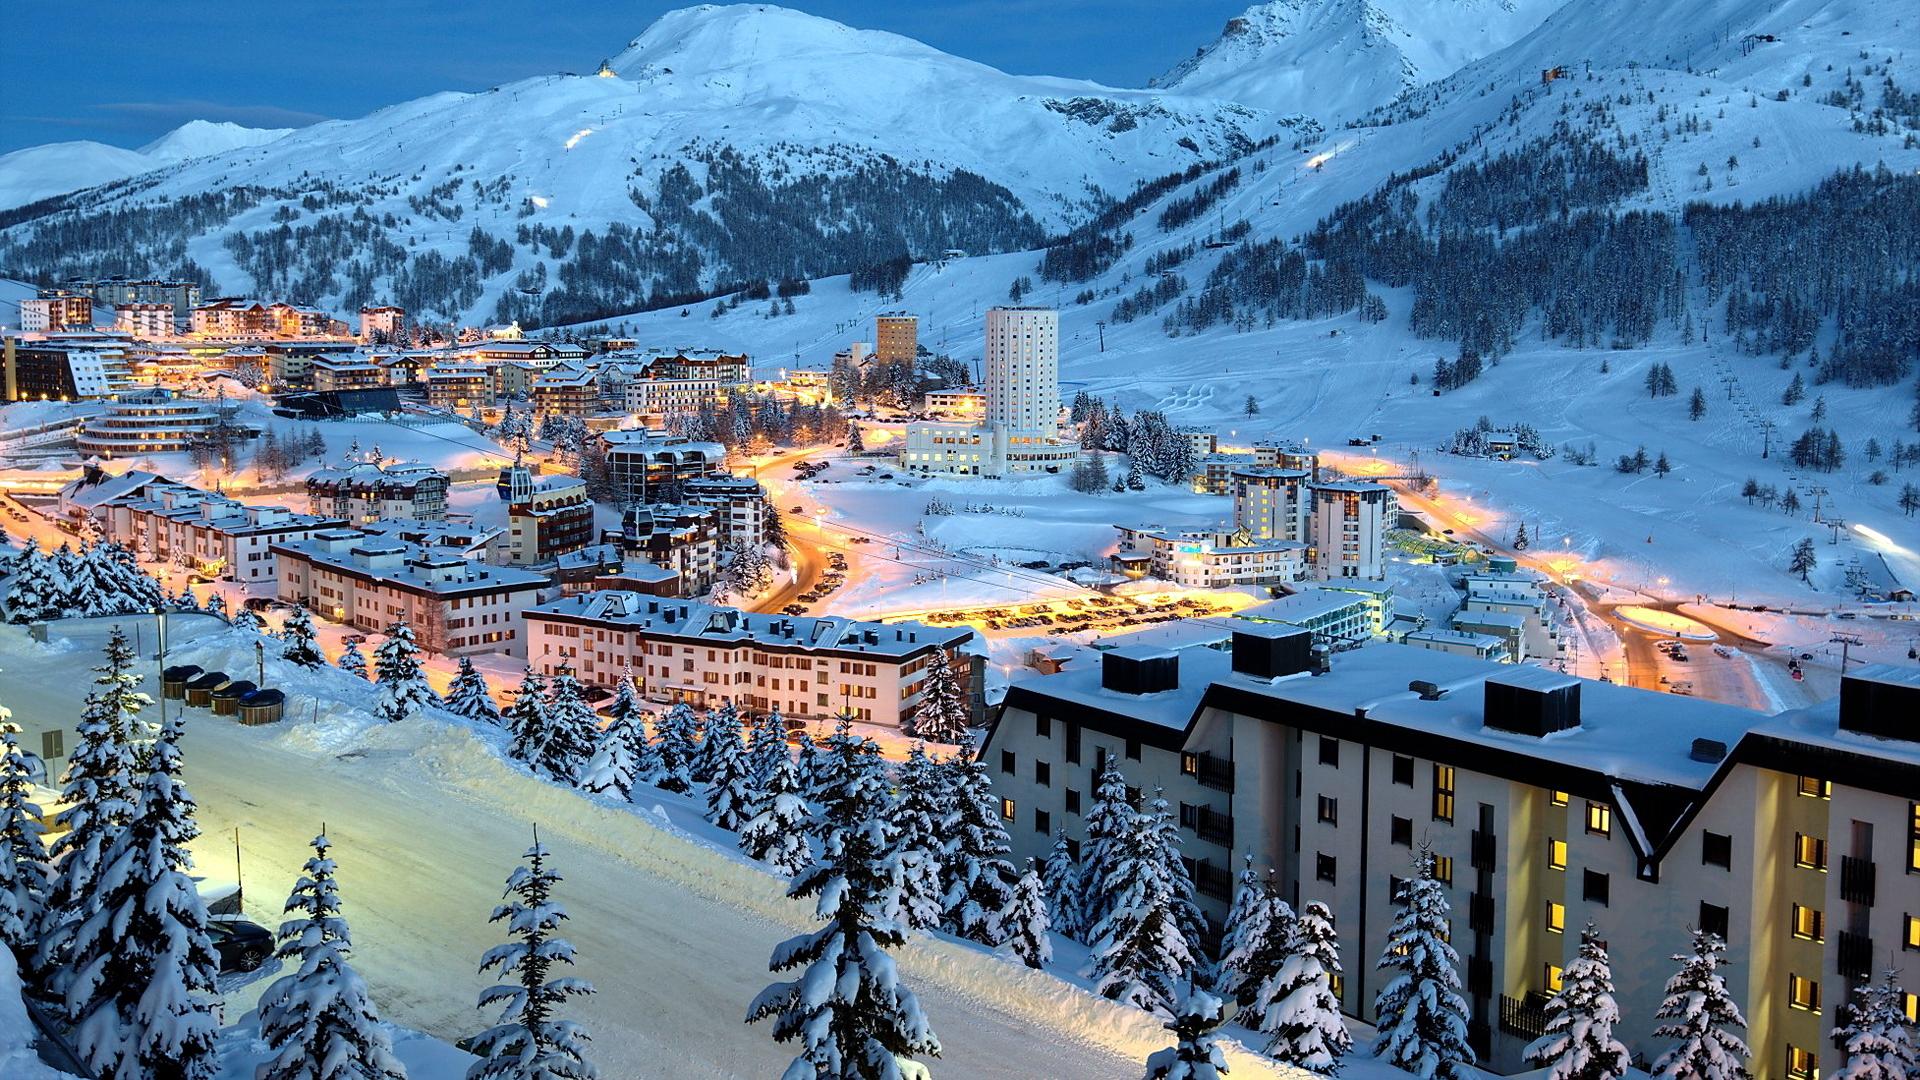 Beautiful mountain ski resort   WALLPAPERS HD 1920x1080